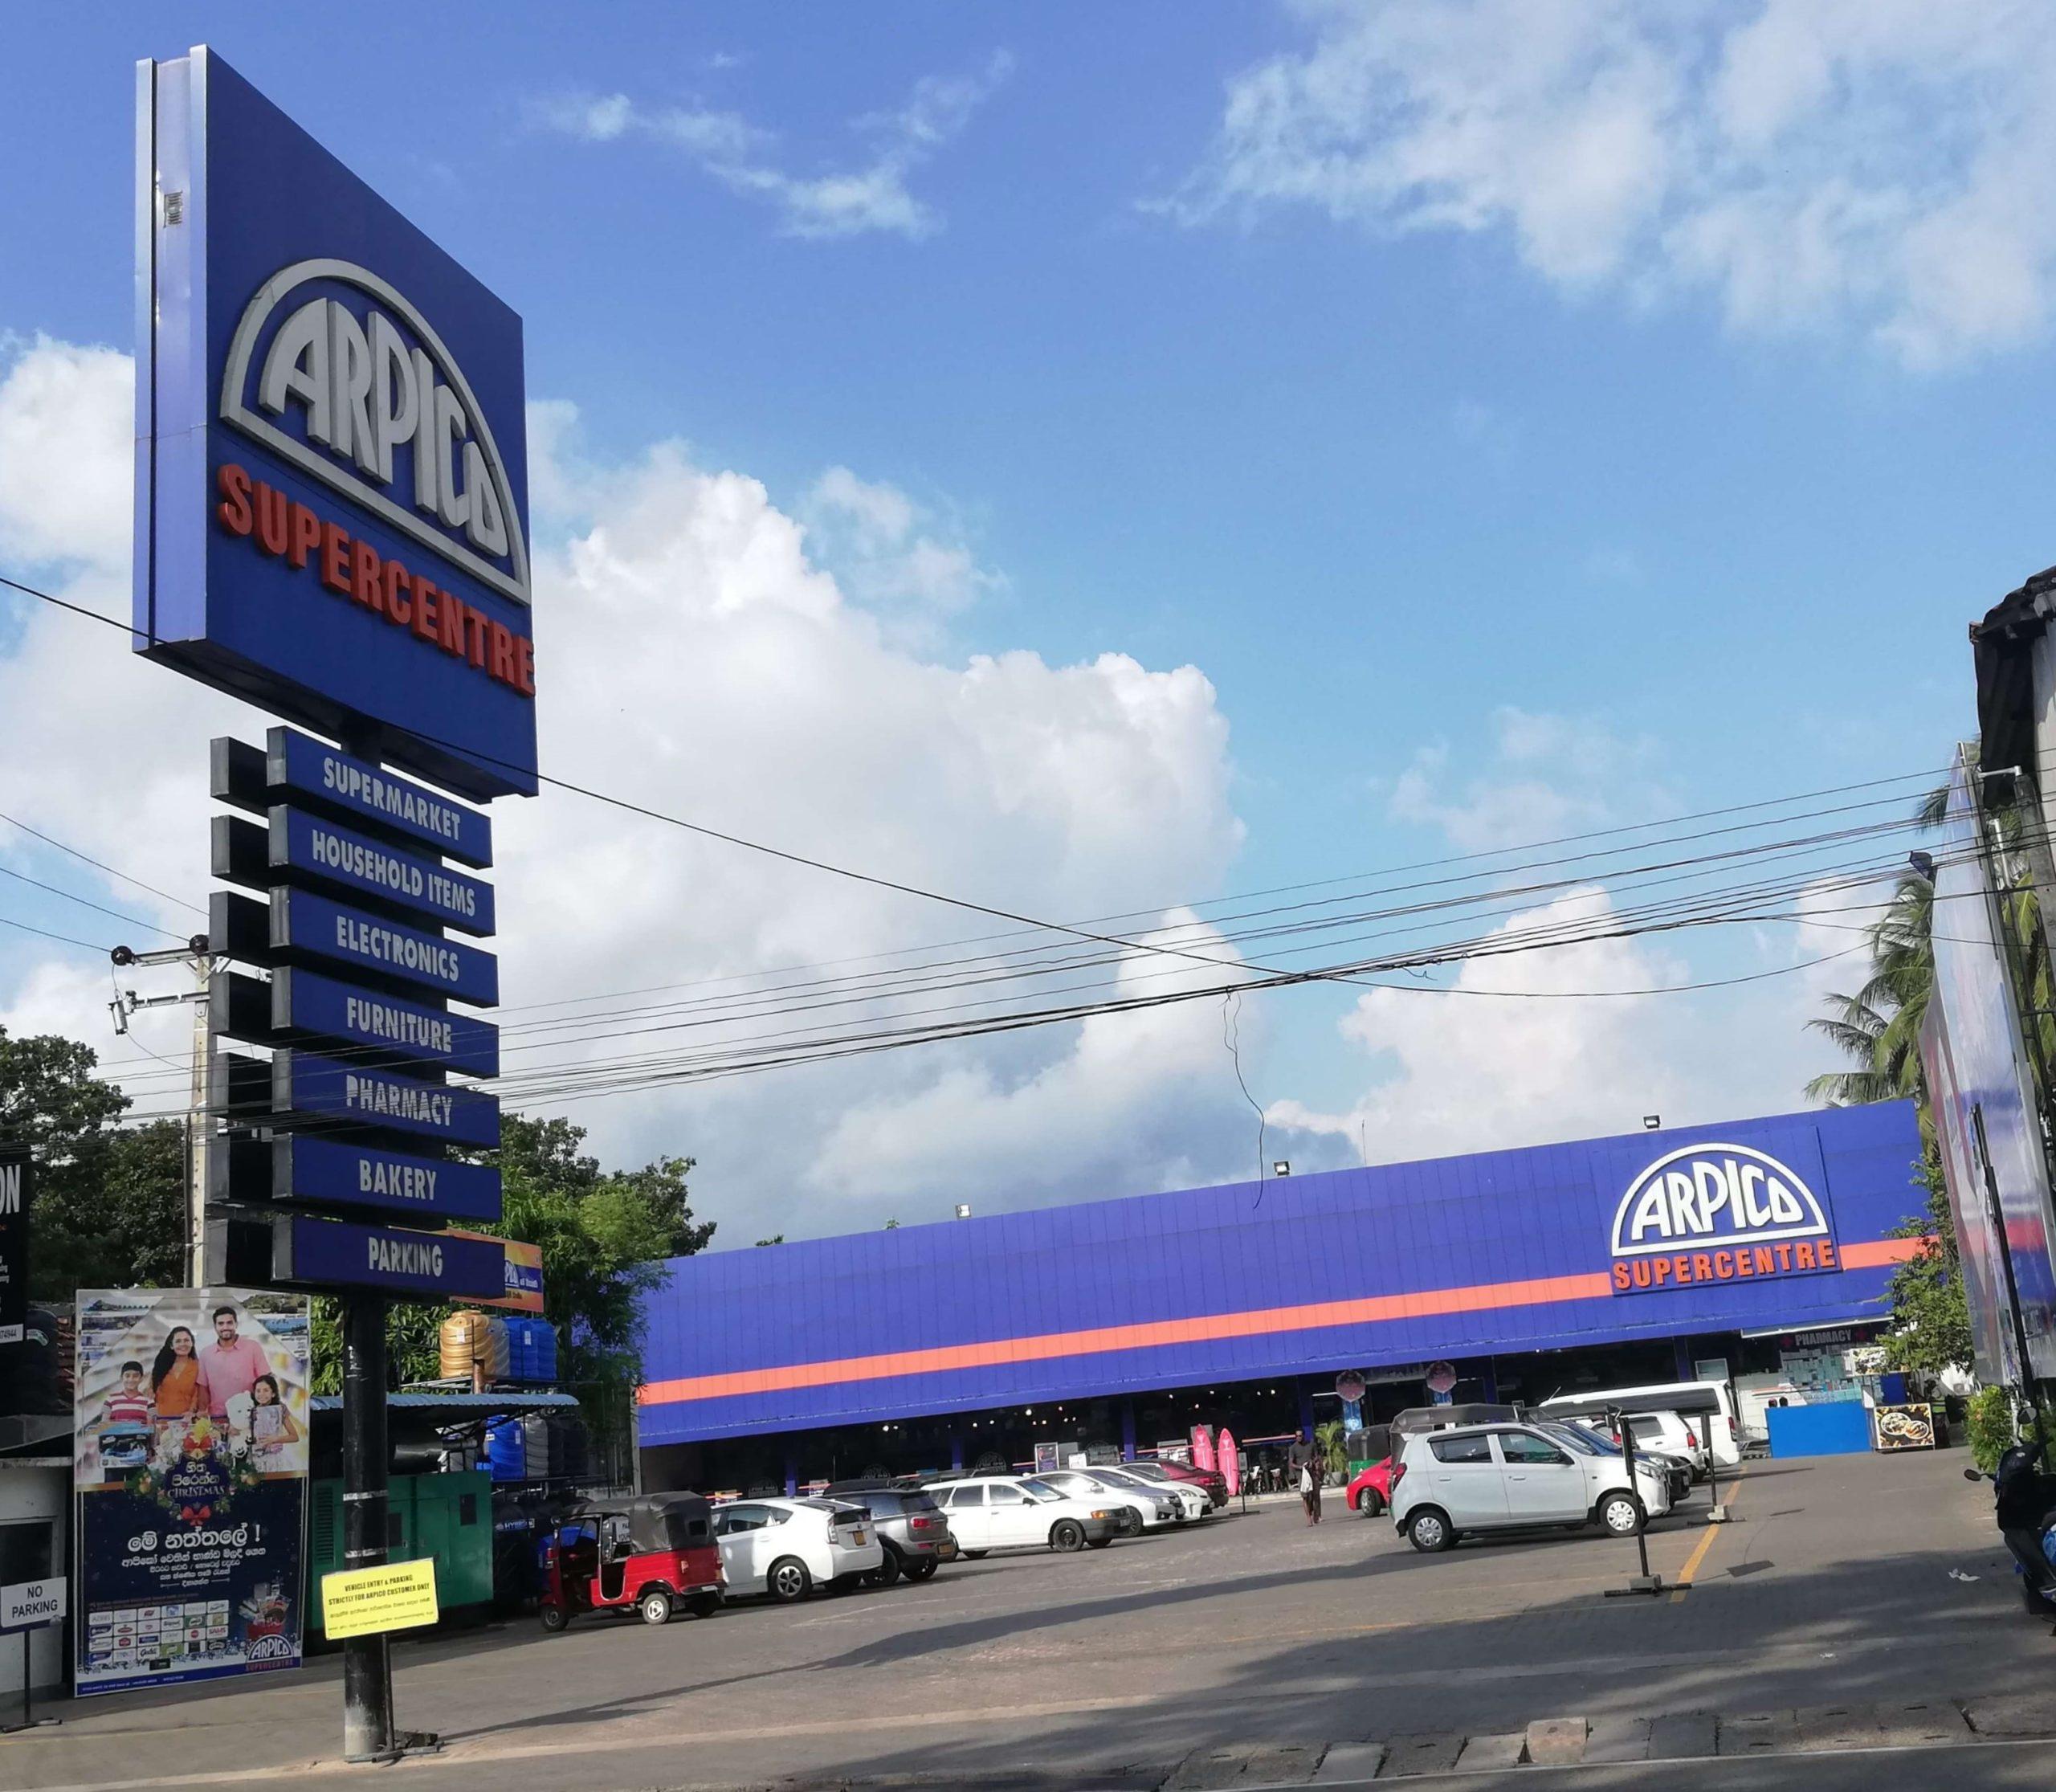 супермаркет арпико в Унаватуне